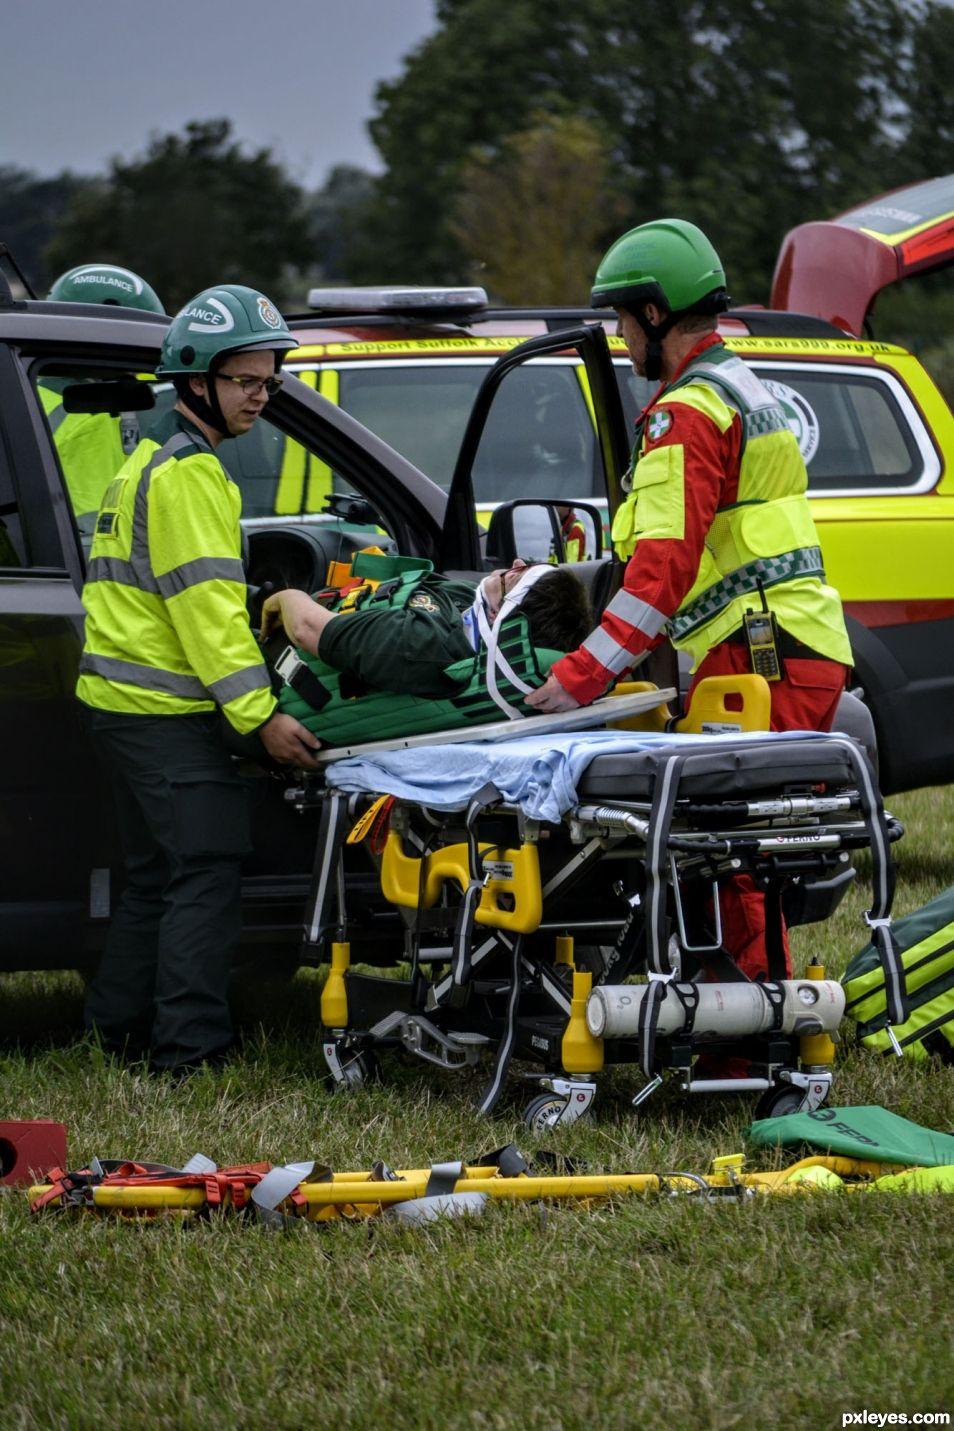 GOOD- Ambulance Crew